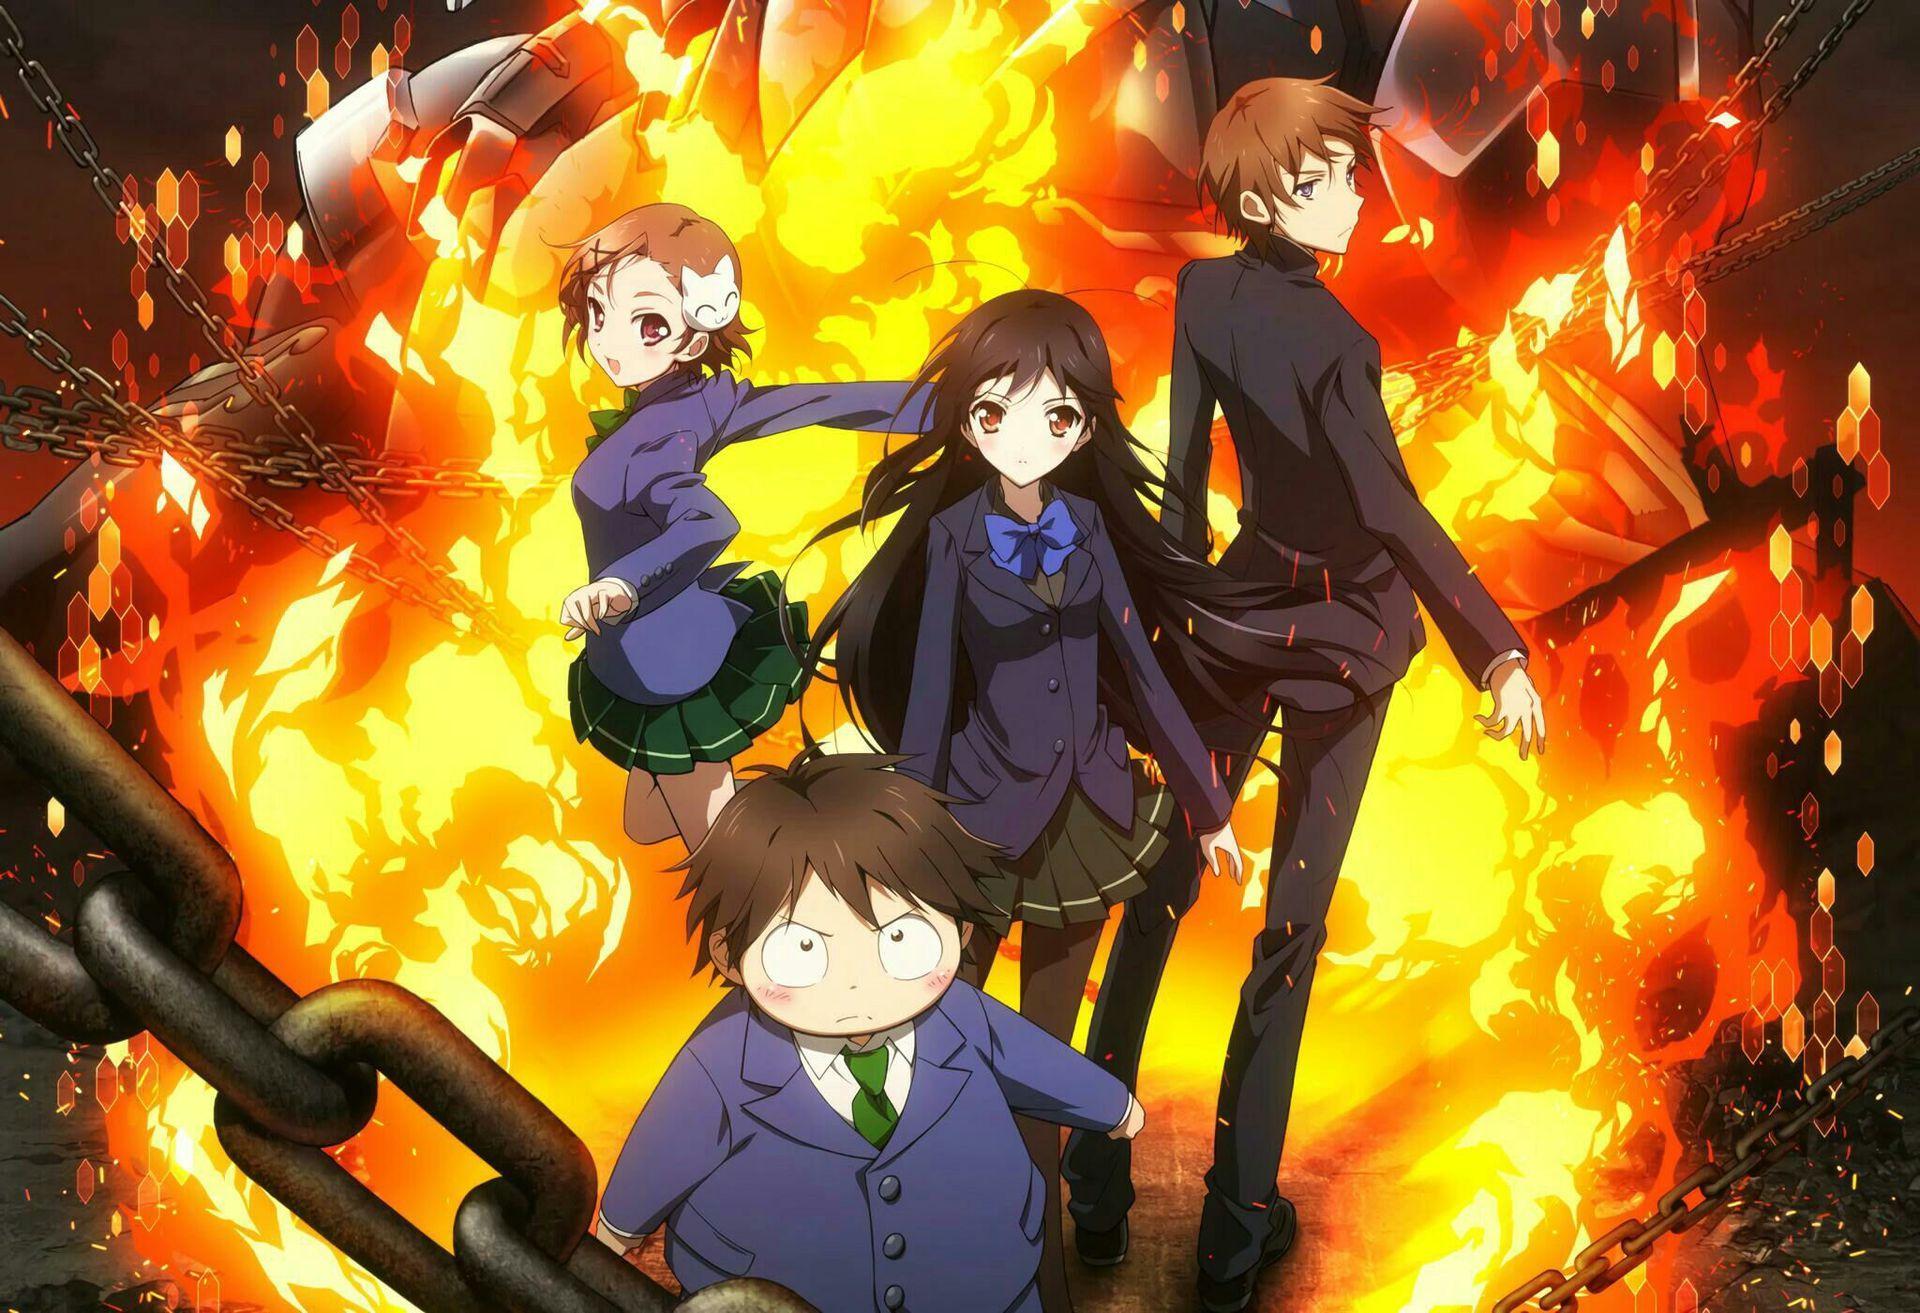 Kumpulan Gambar Anime Jepang Req Off Sementara Accel Word